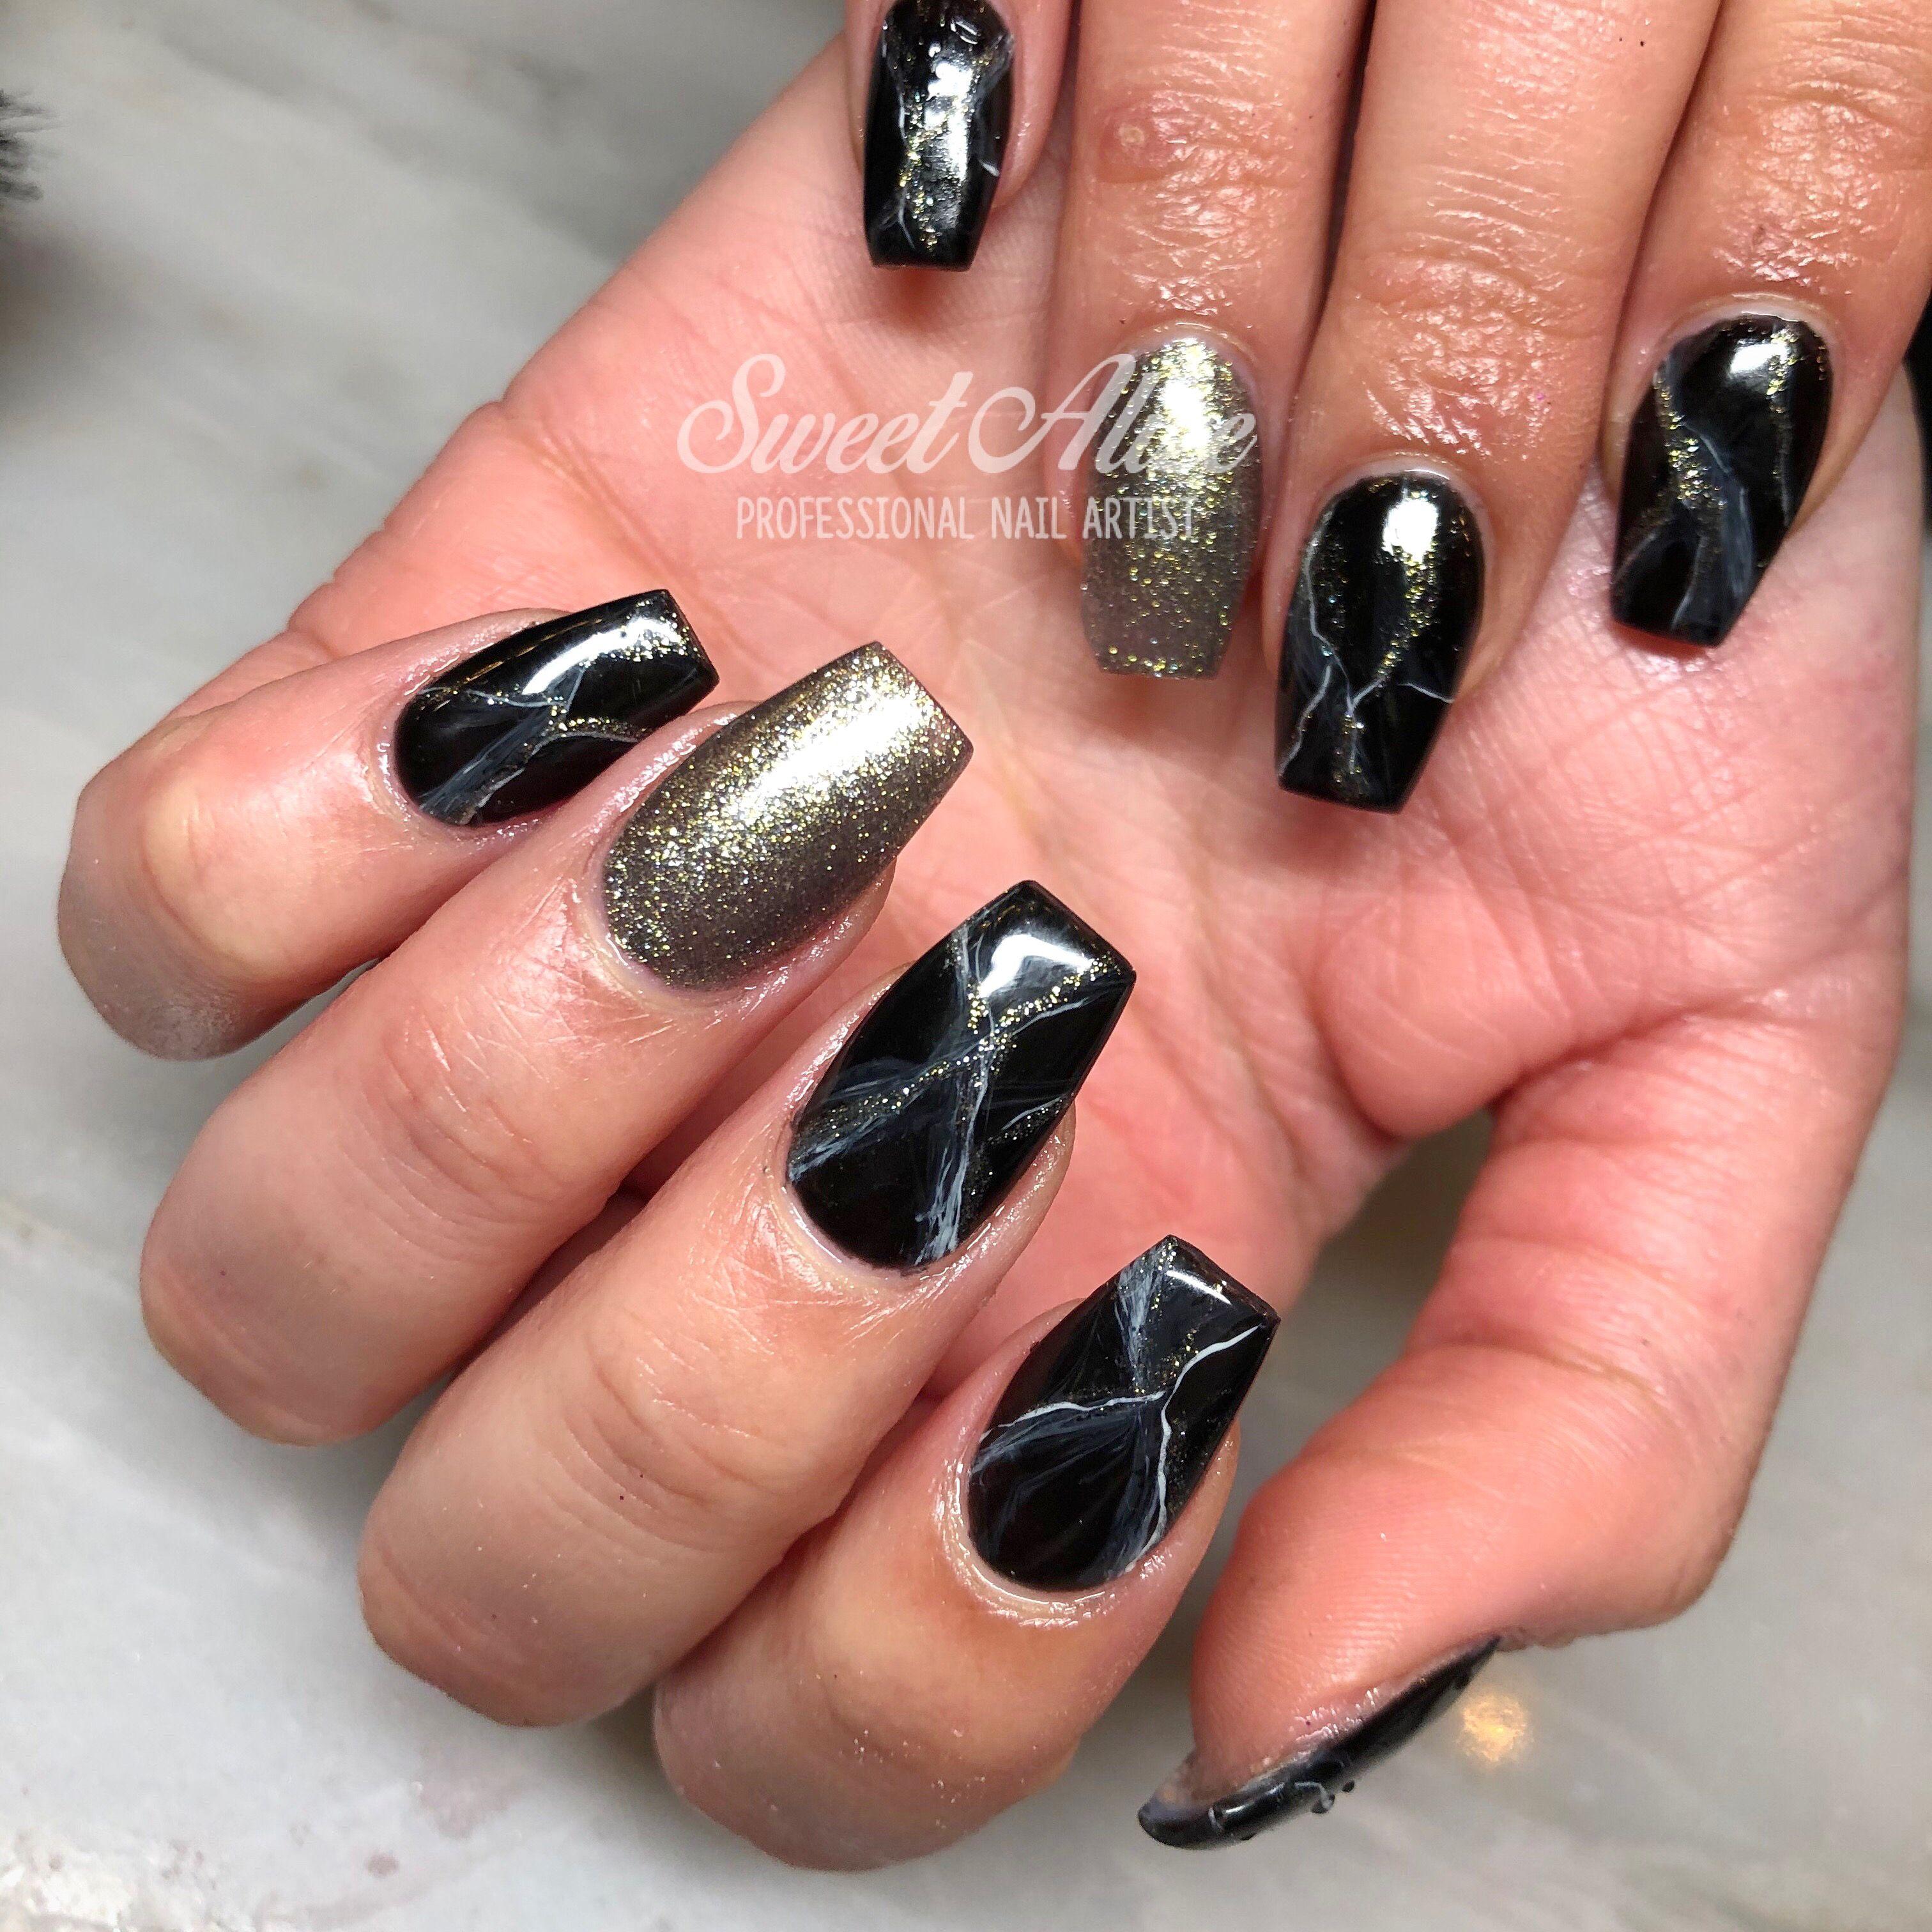 Deal on Gel Polish Acrylic Nails! - Good Talk TnT